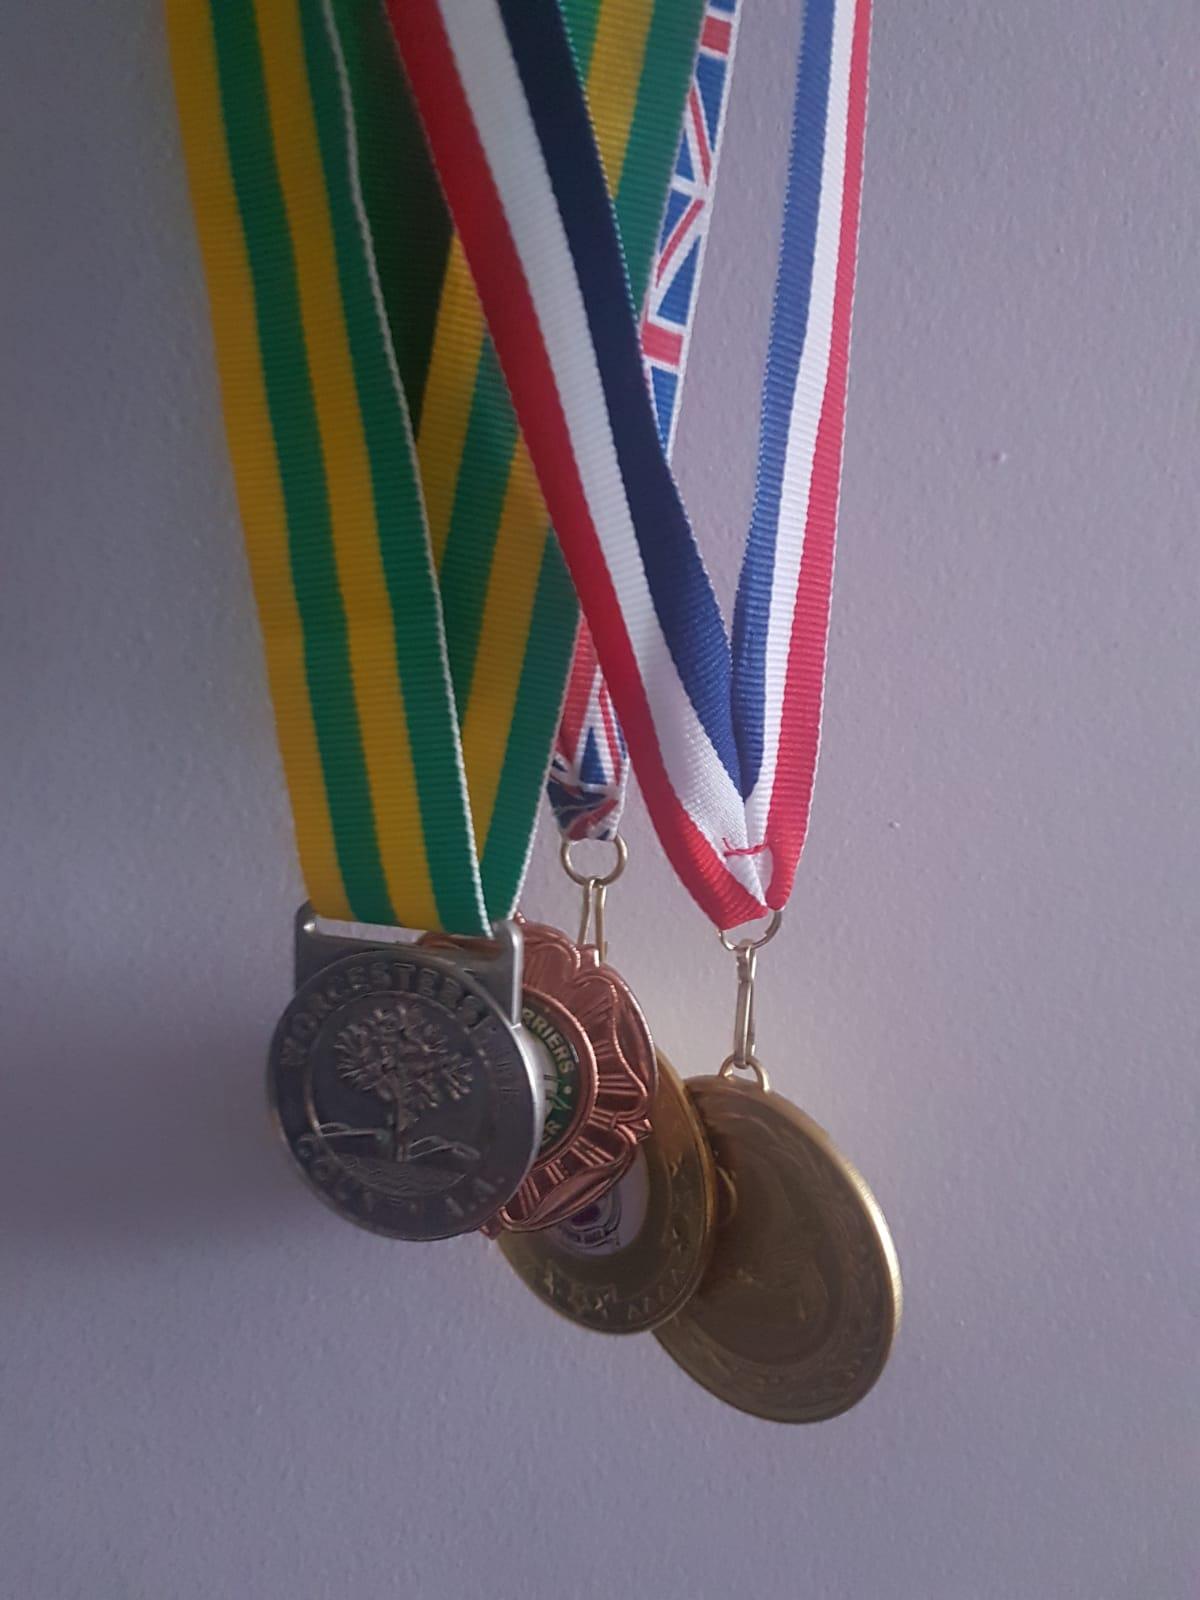 james h medals